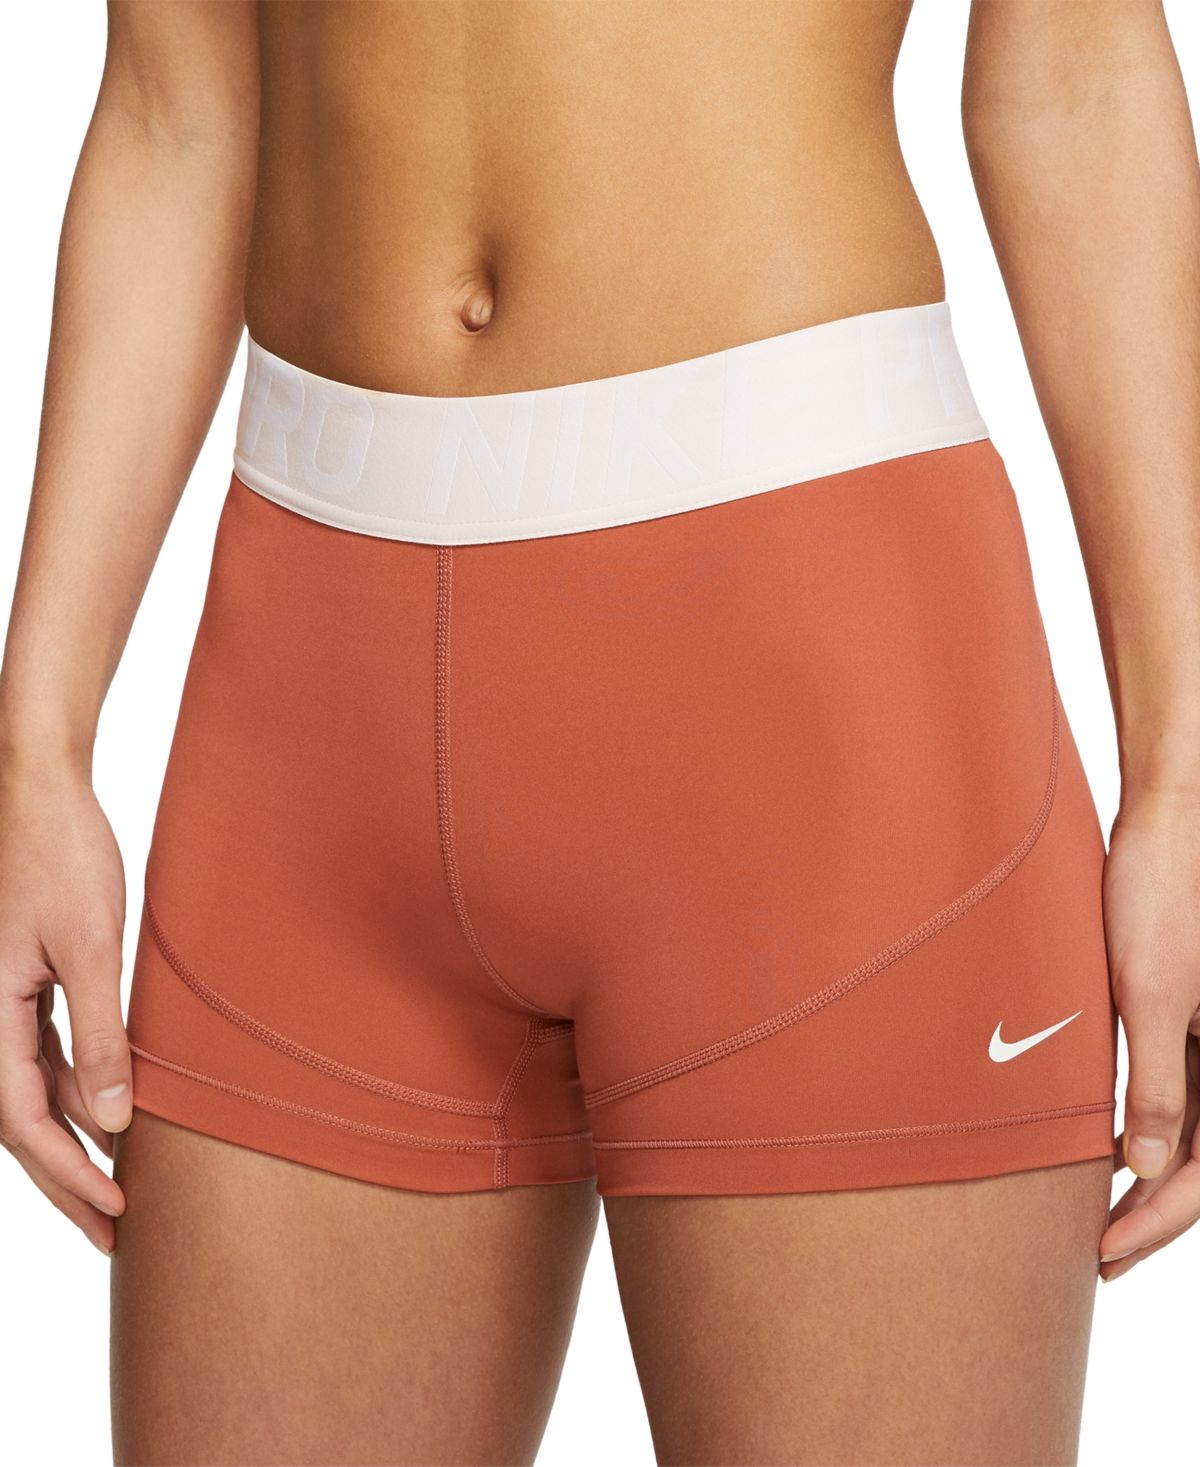 Nike Women S Pro 3 Shorts Reviews Women Macy S Workout Clothes Nike Nike Spandex Shorts Nike Pros